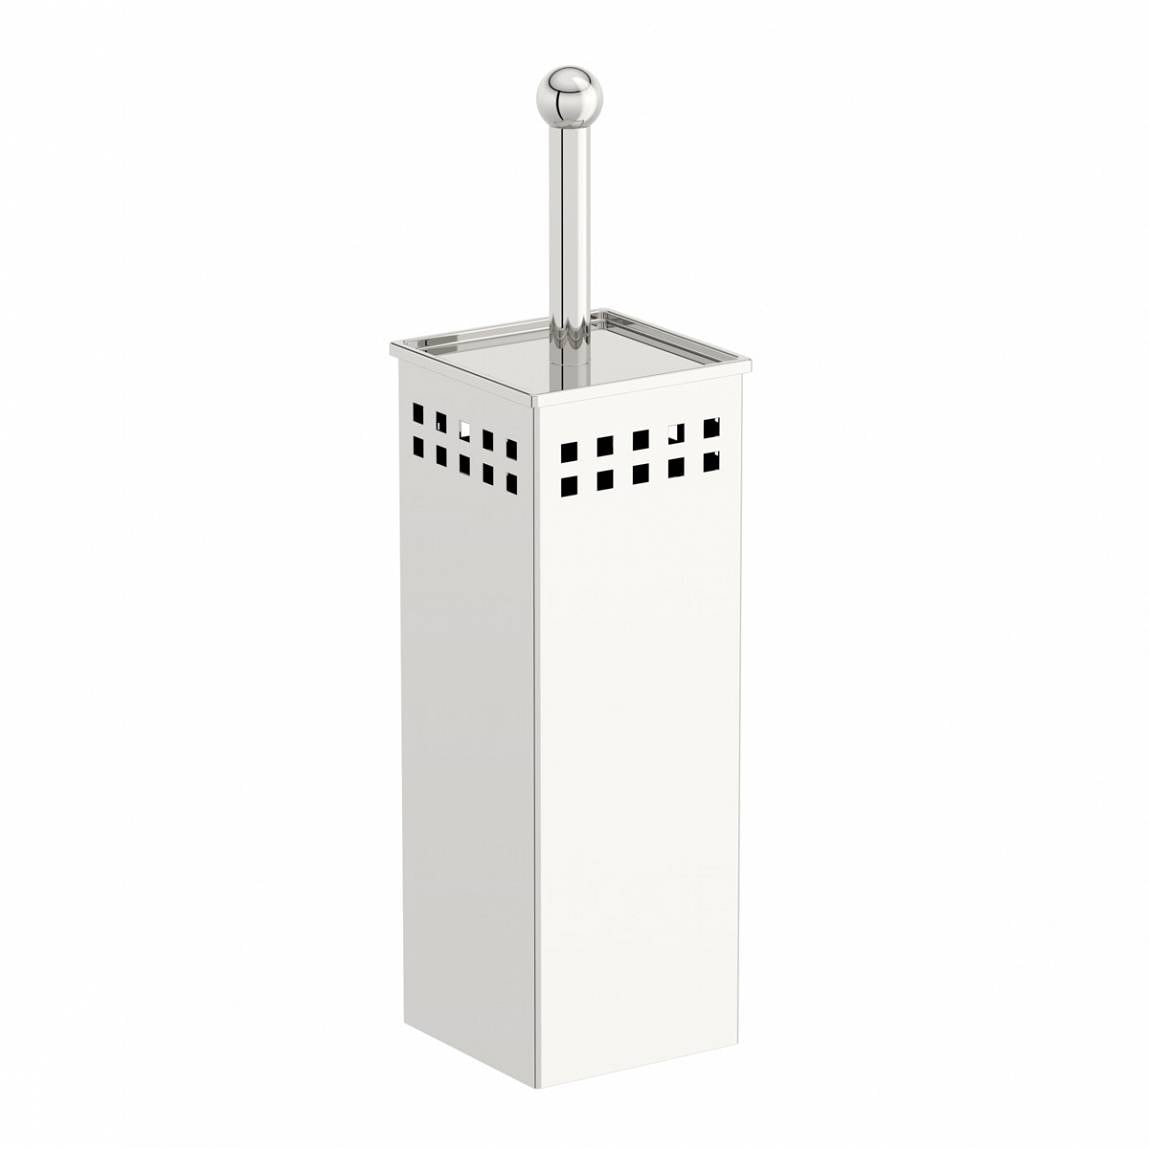 Orchard Options freestanding stainless steel square toilet brush holder